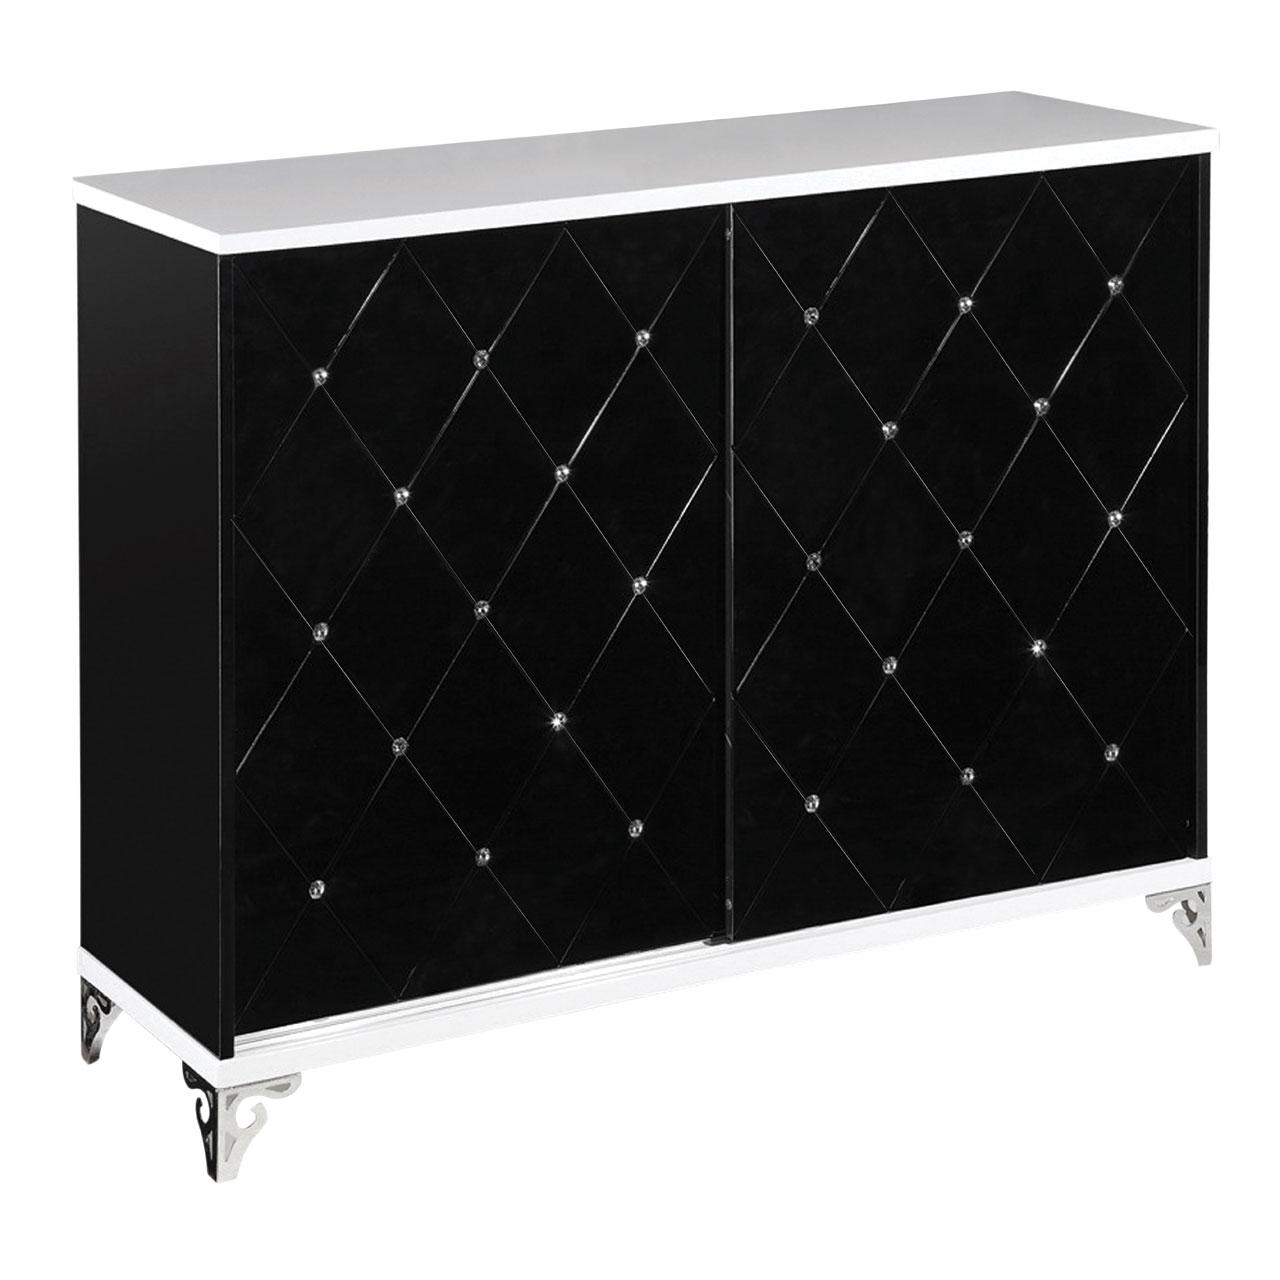 Radiance Sideboard Sliding Door Black White High Gloss Cabinet